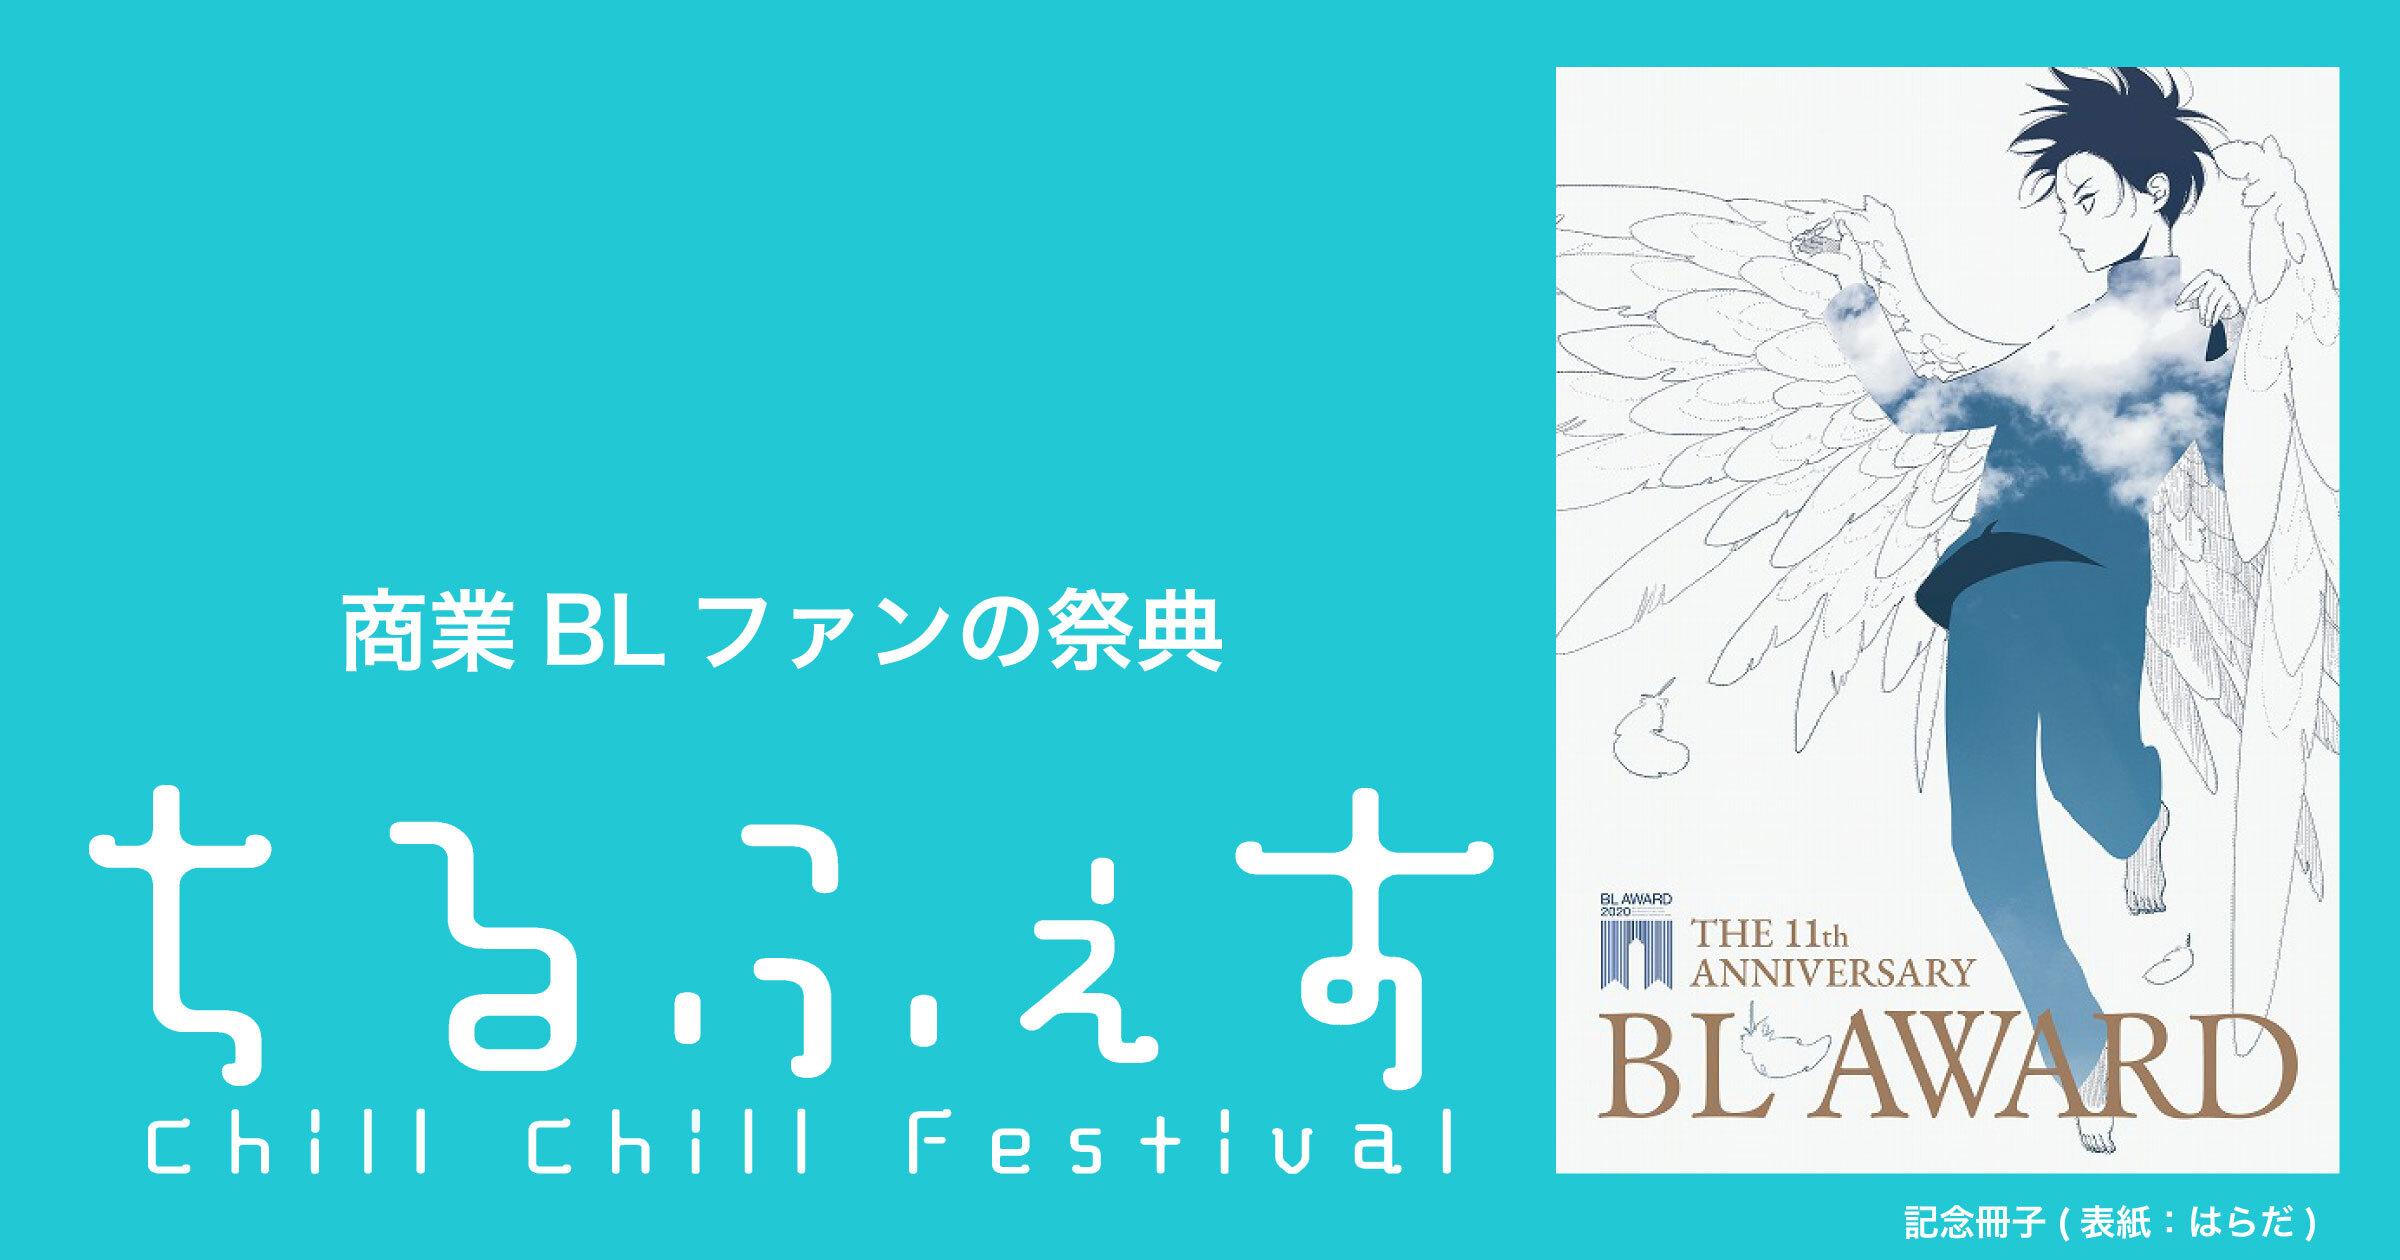 【CHILL CHILL FESTIVAL 3rd】7月19日複製原画展入場整理券